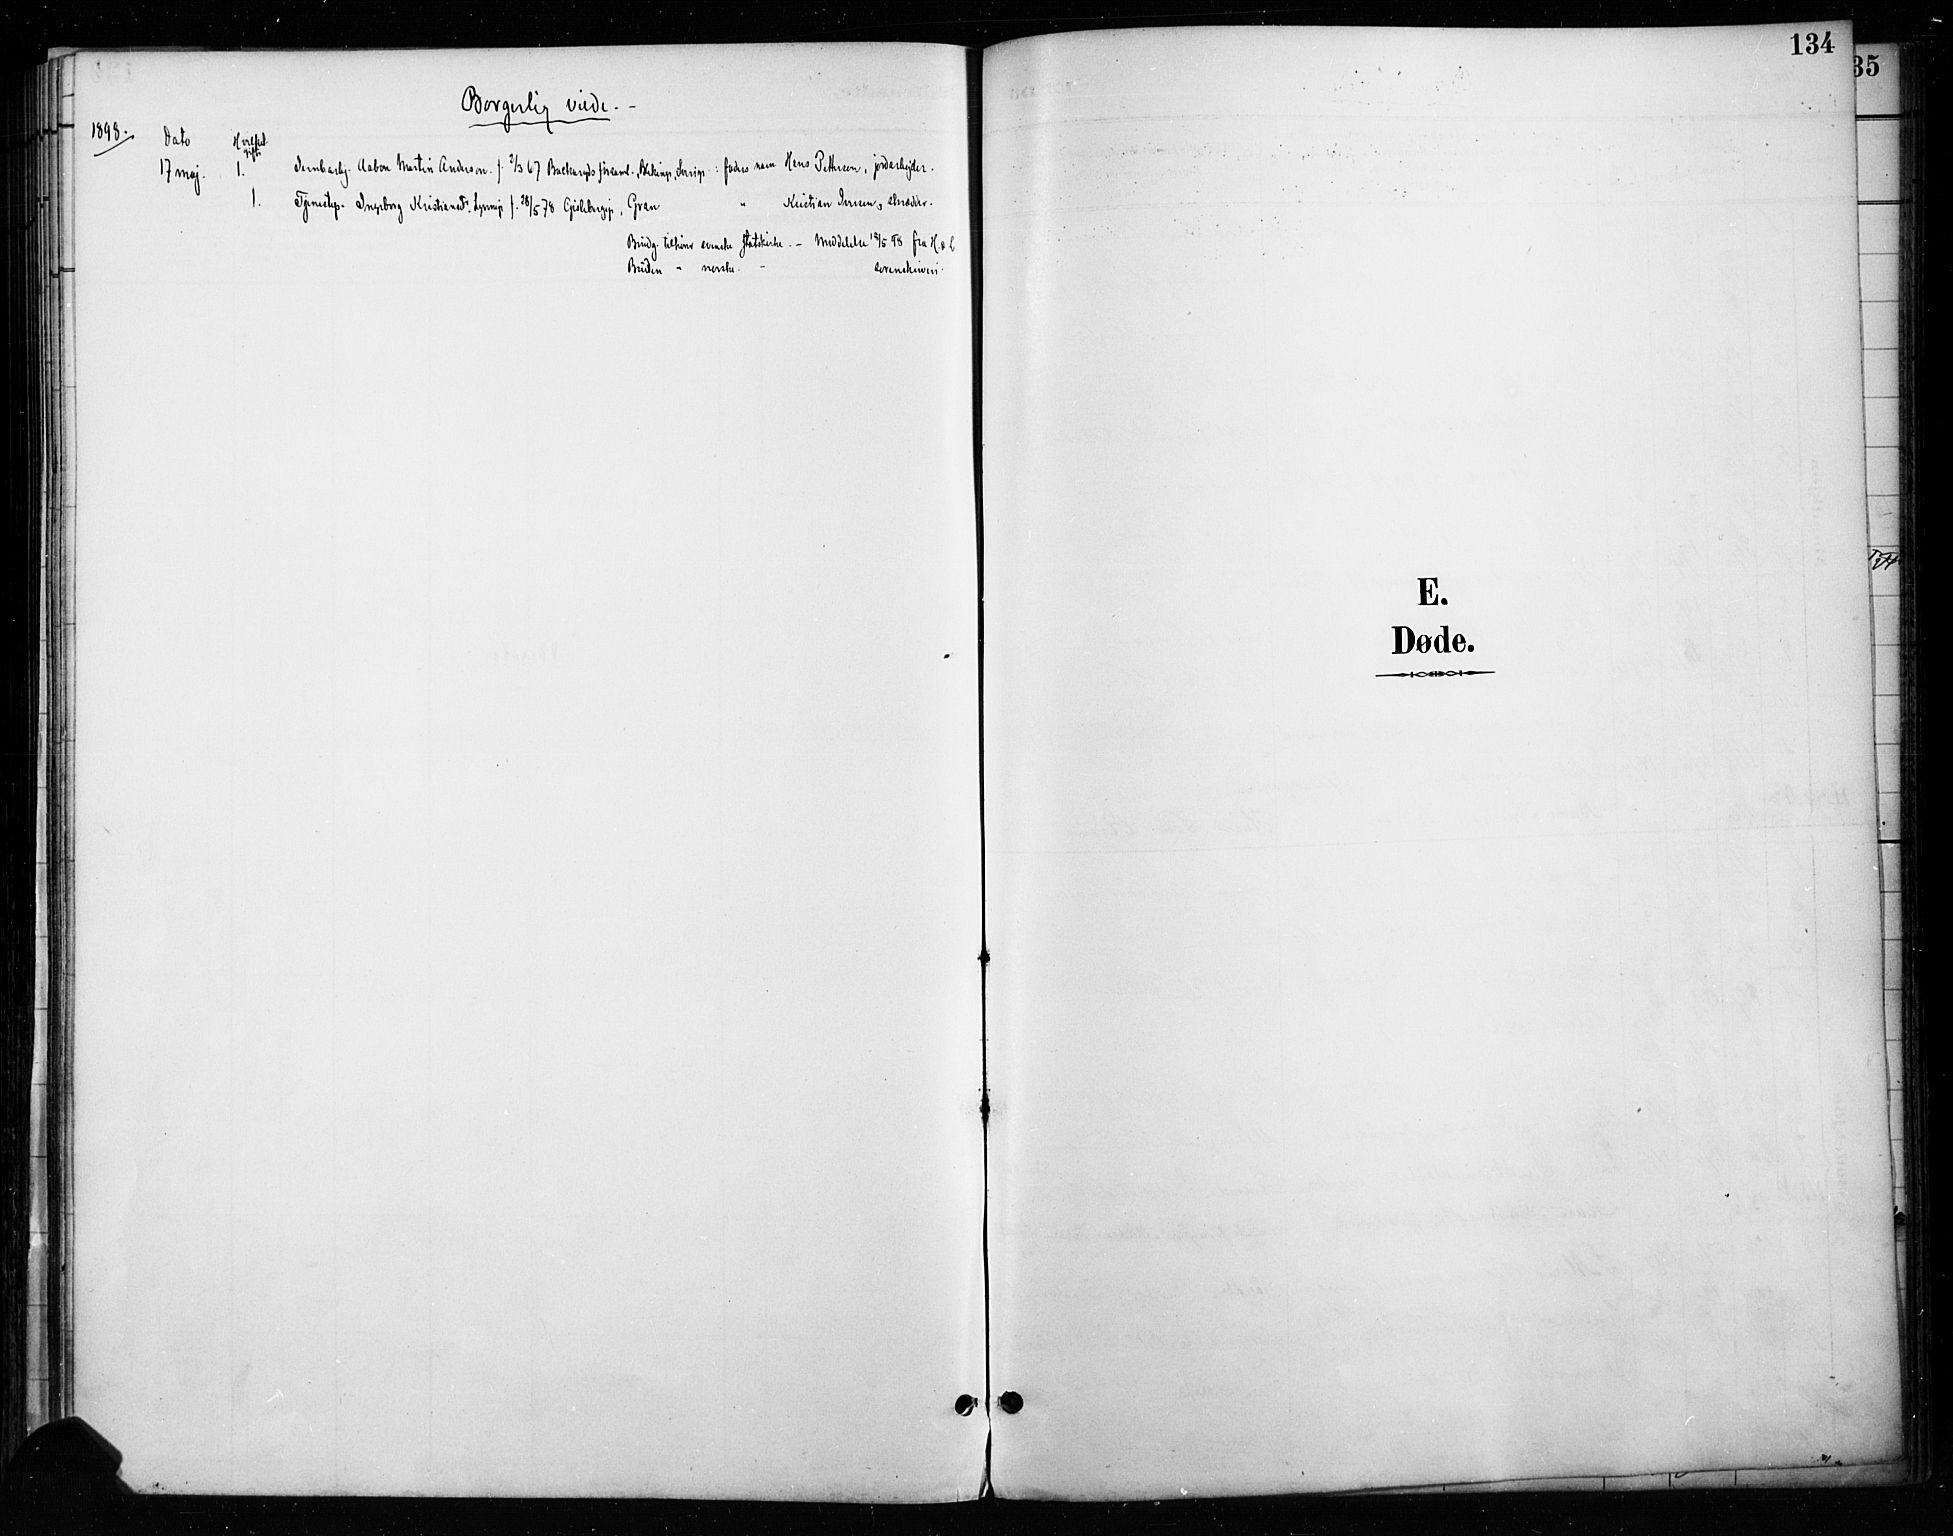 SAH, Gran prestekontor, Ministerialbok nr. 18, 1889-1899, s. 134